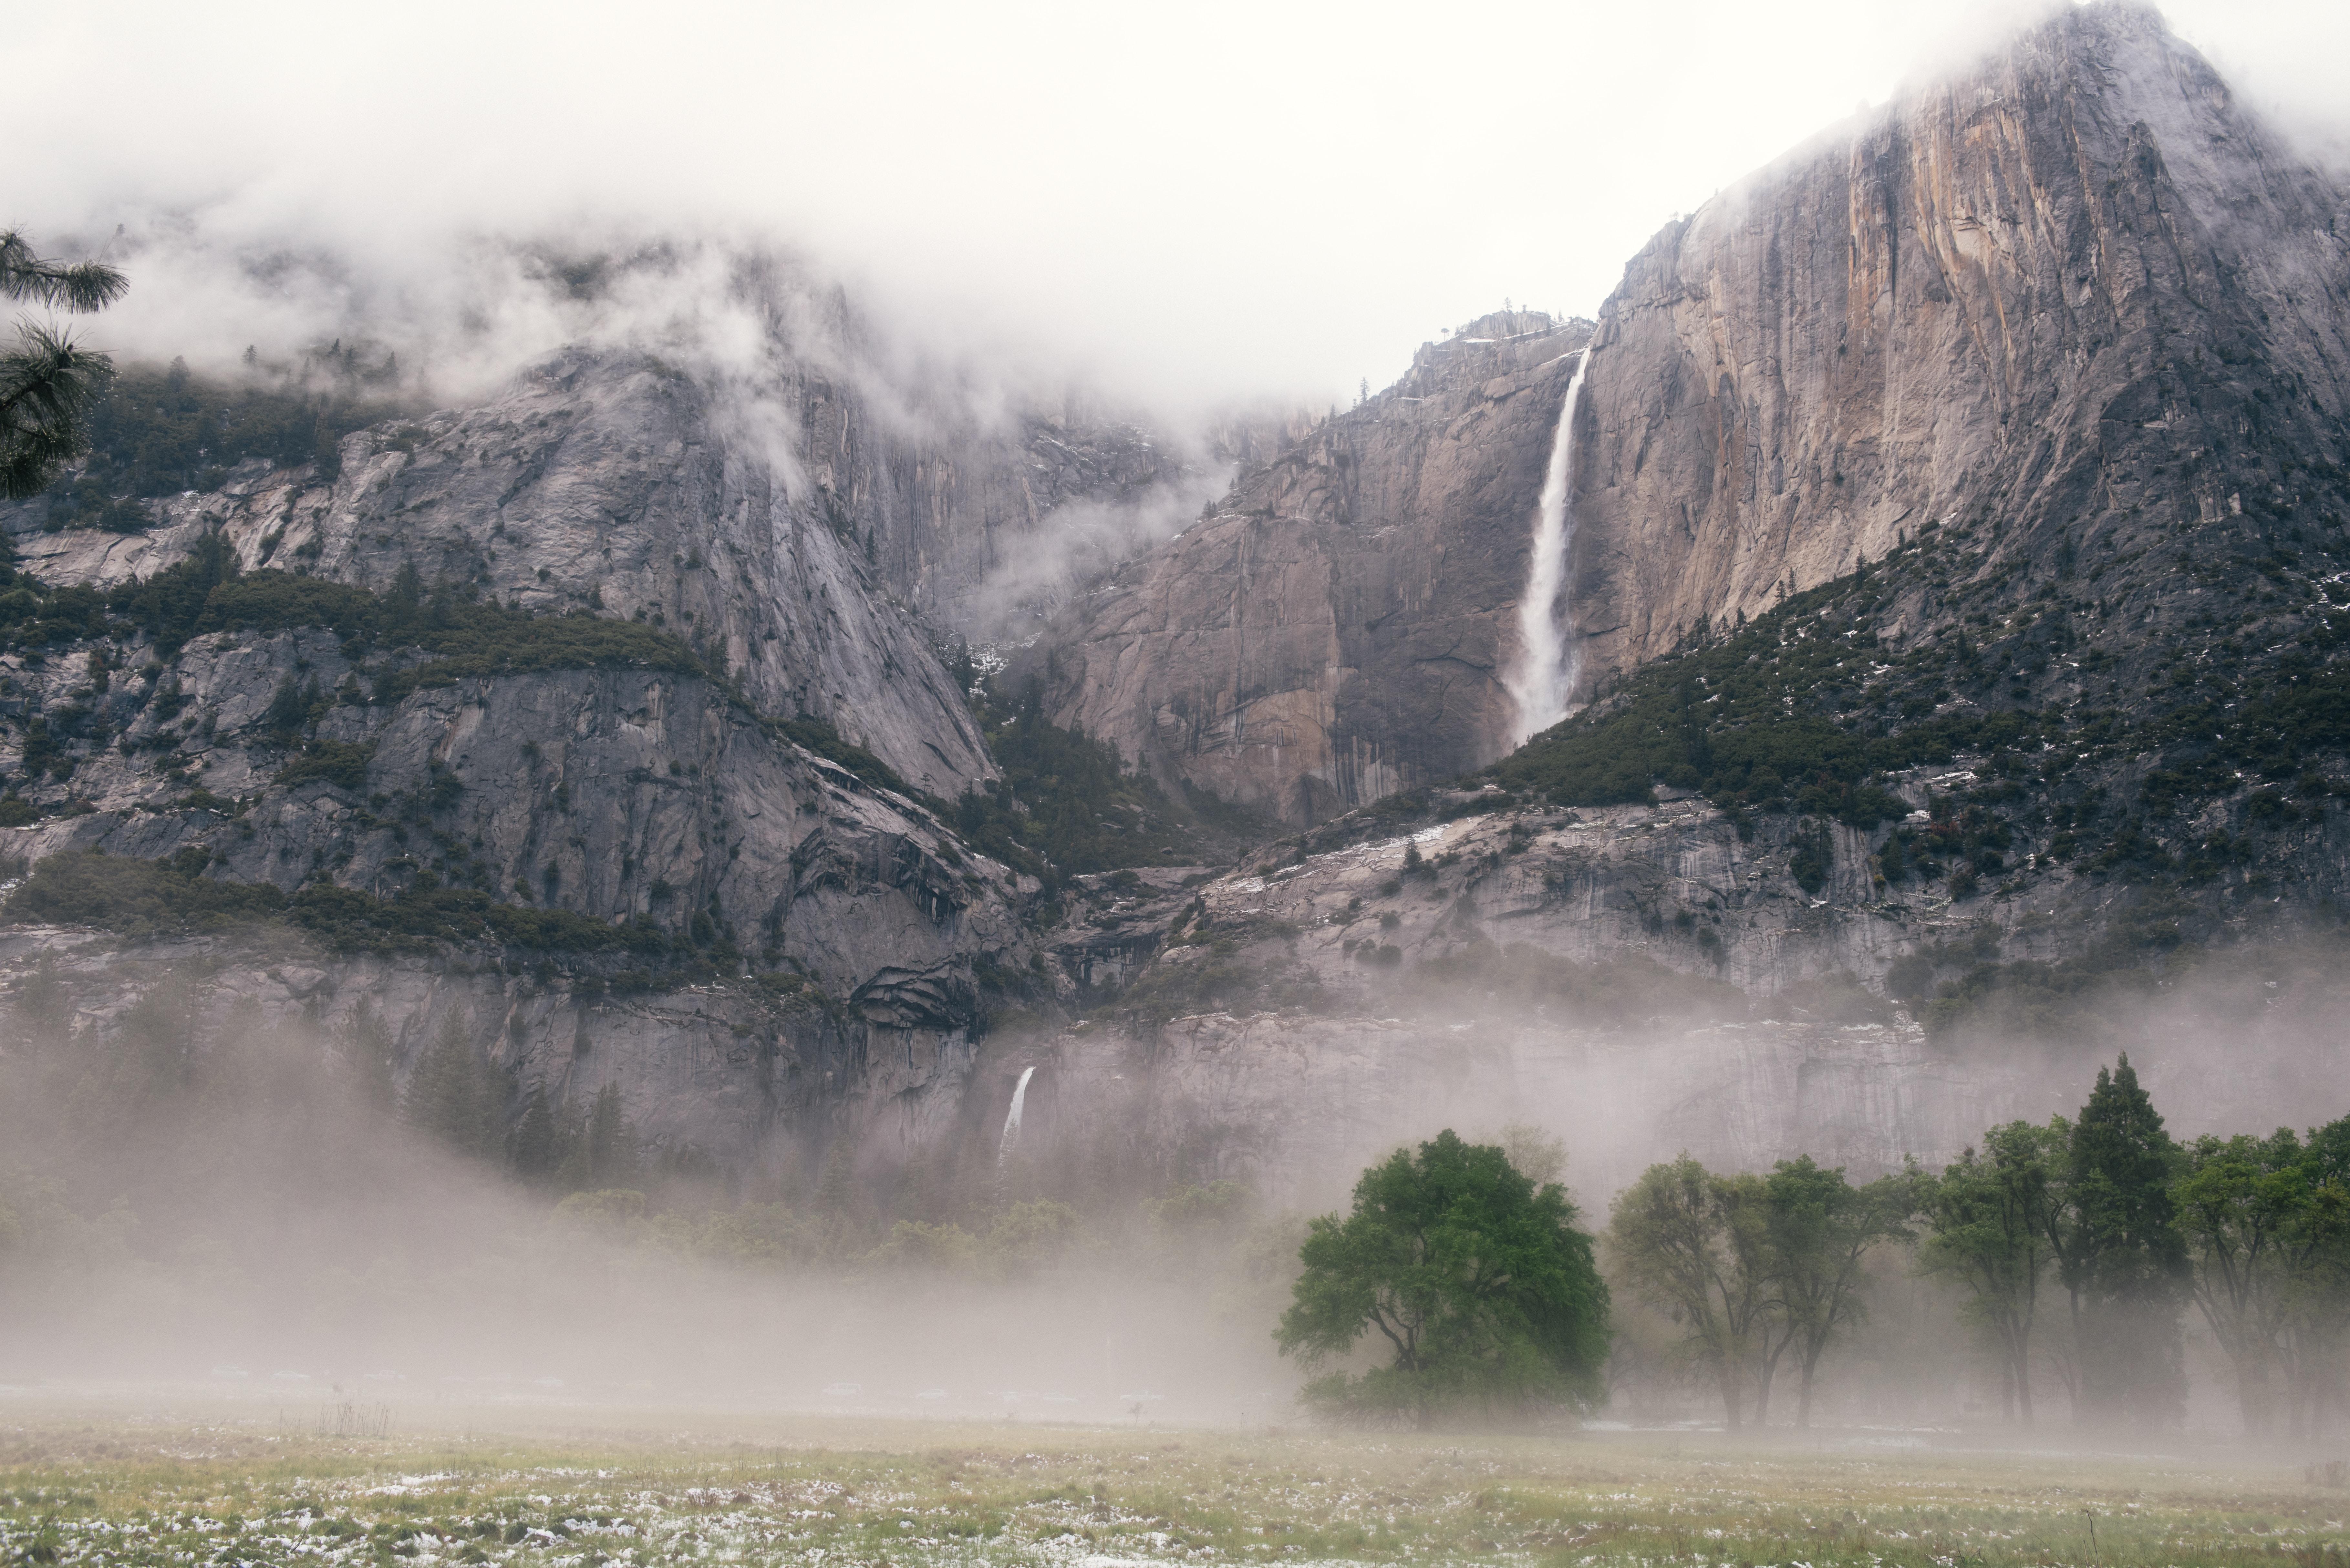 waterfalls between rocky mountain